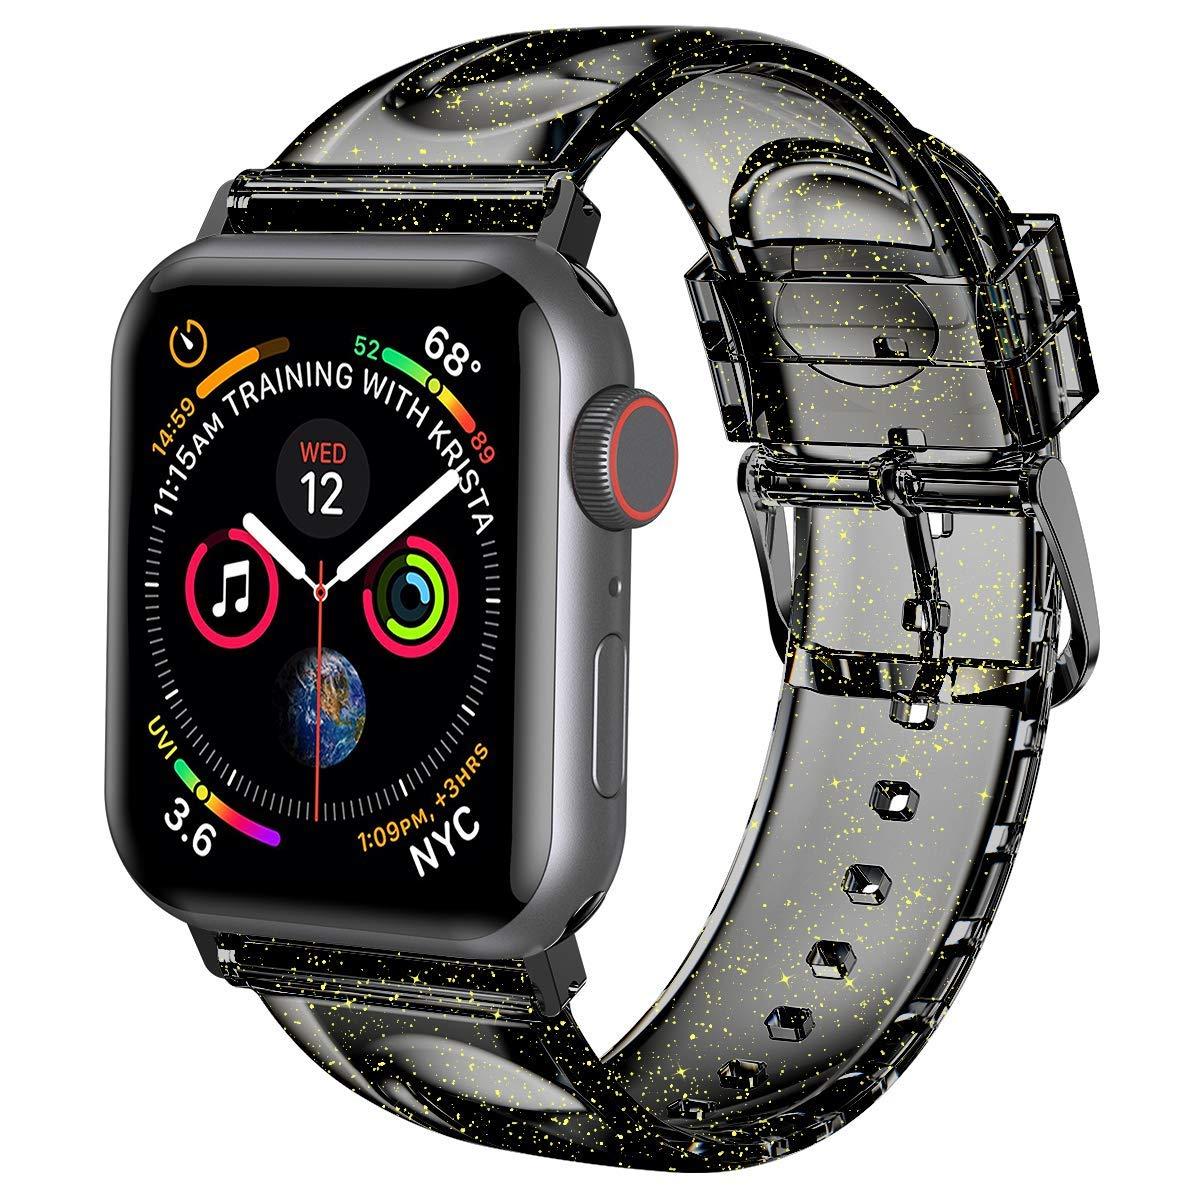 Malla Silicona para Apple Watch (42/44mm) IITEEOLOGY [JDDRD]